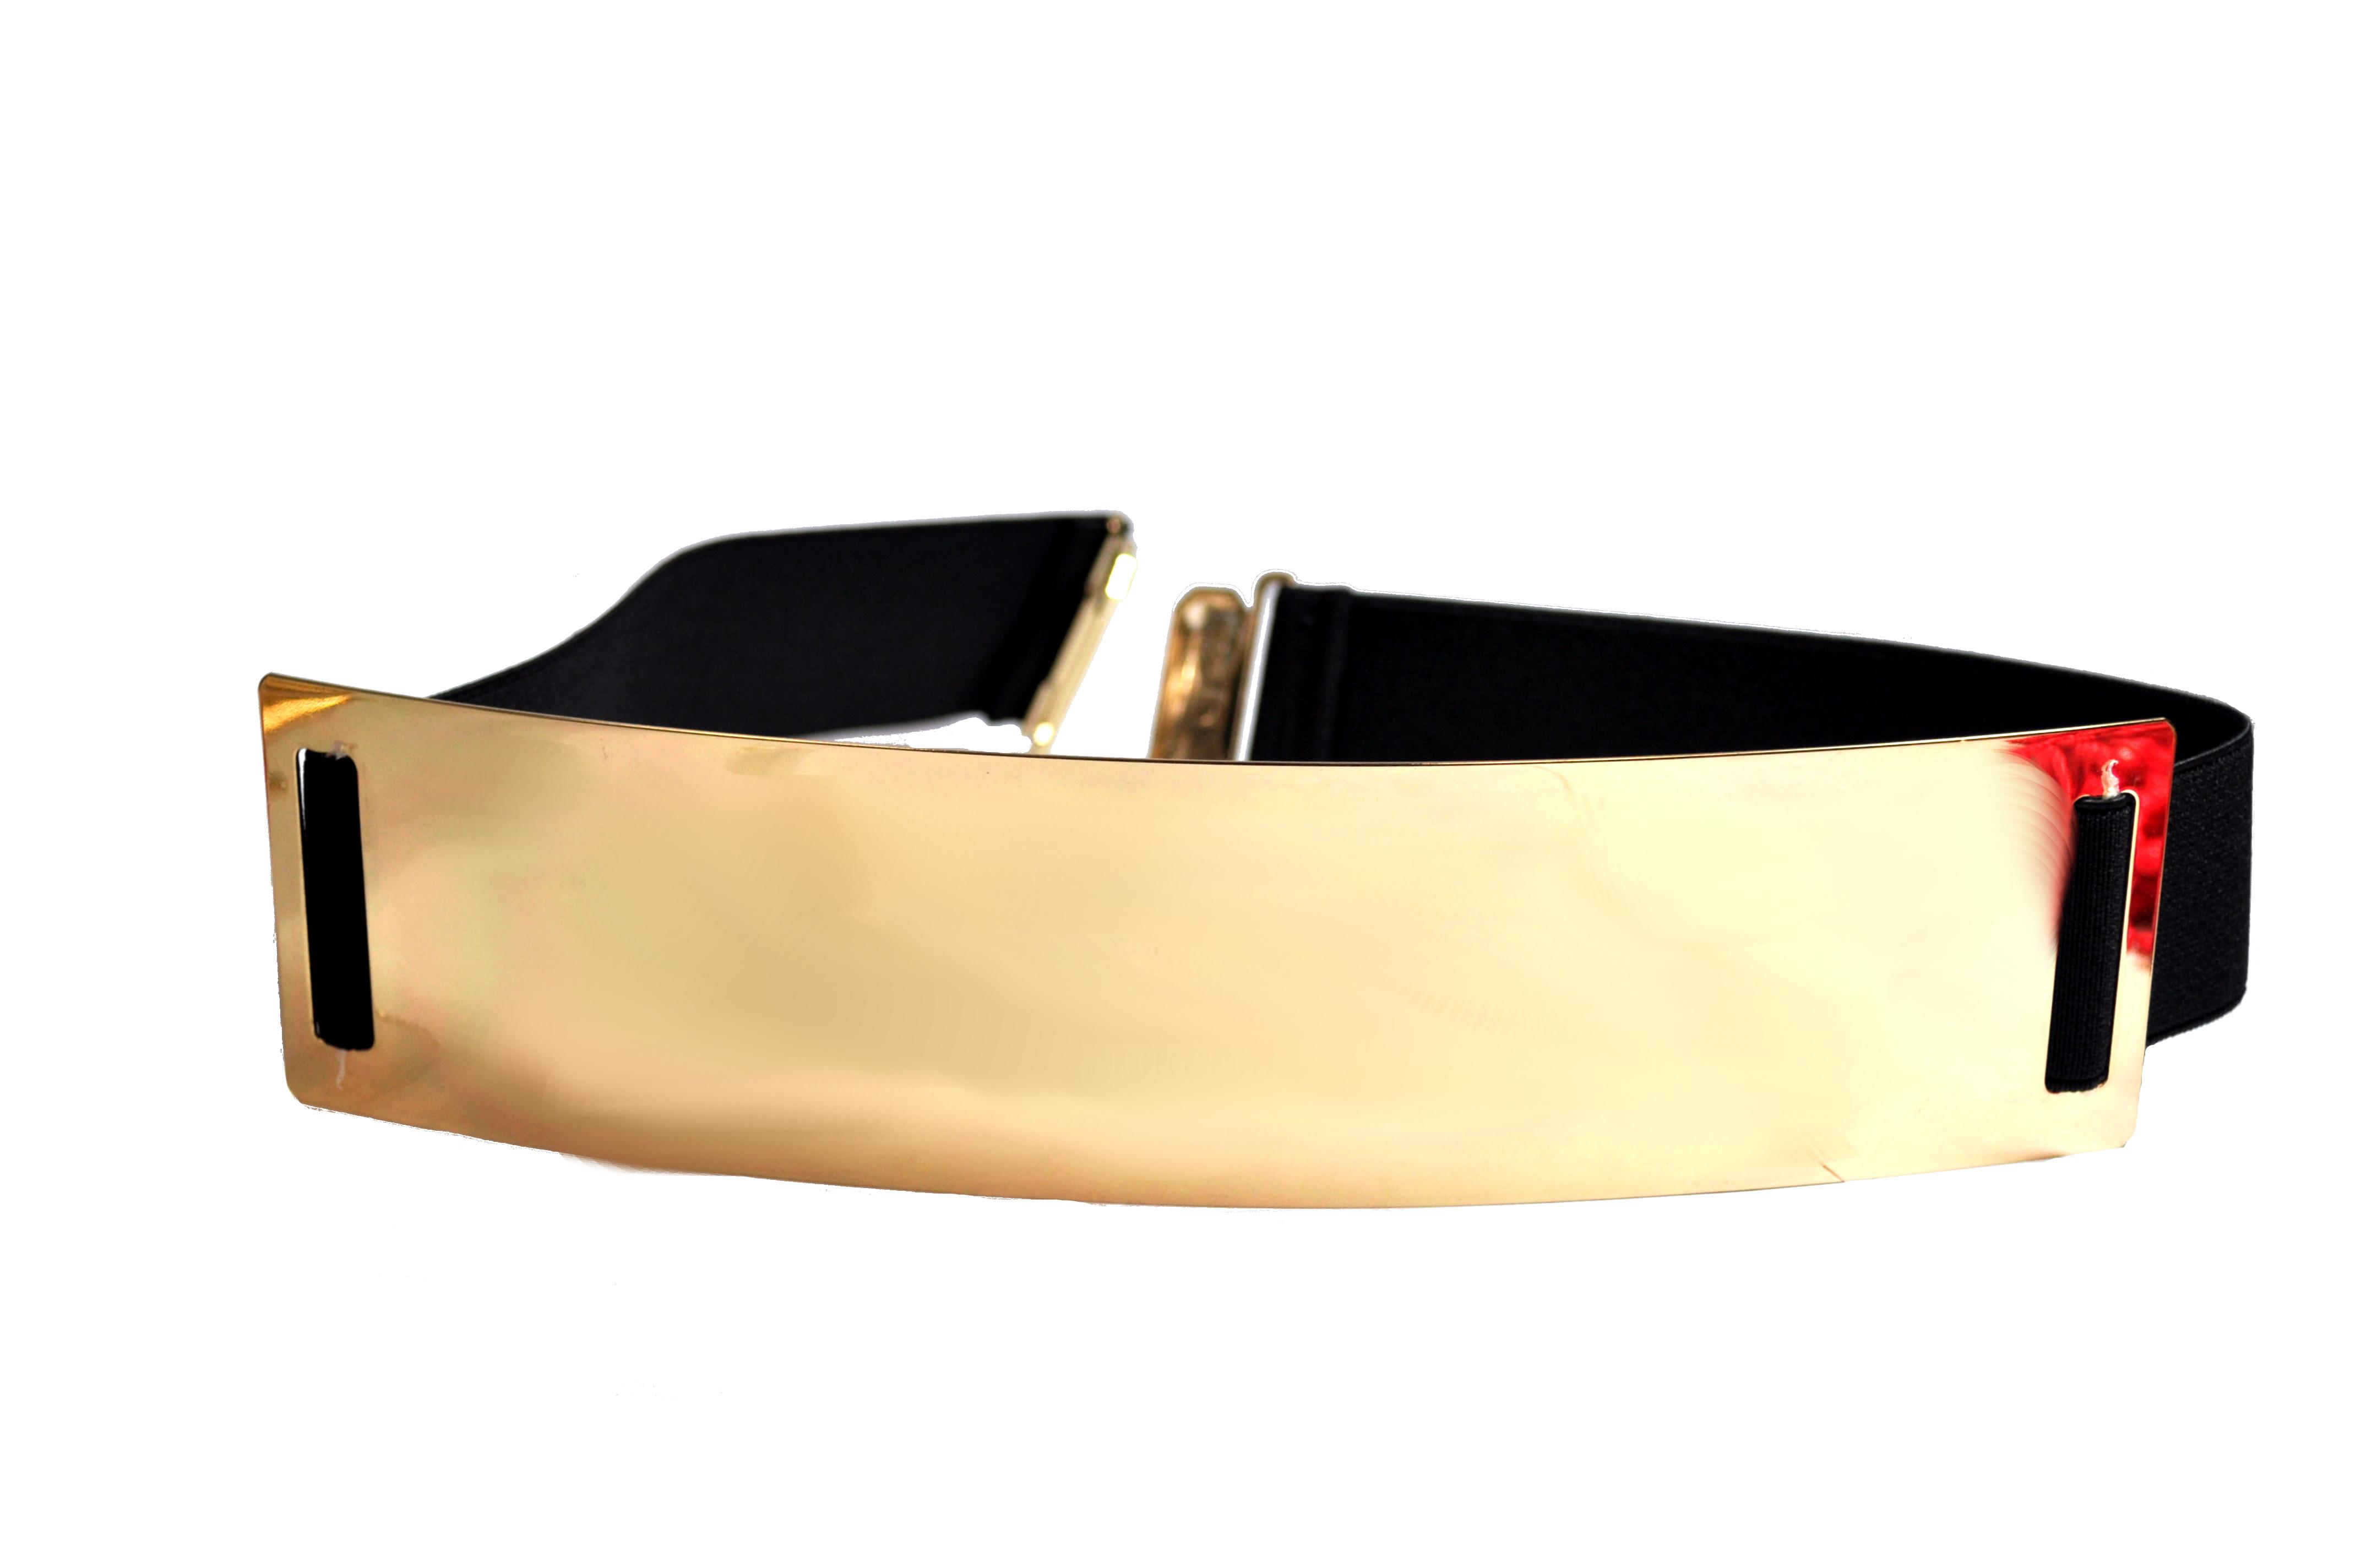 Gold And Black Cummerband Belt-0